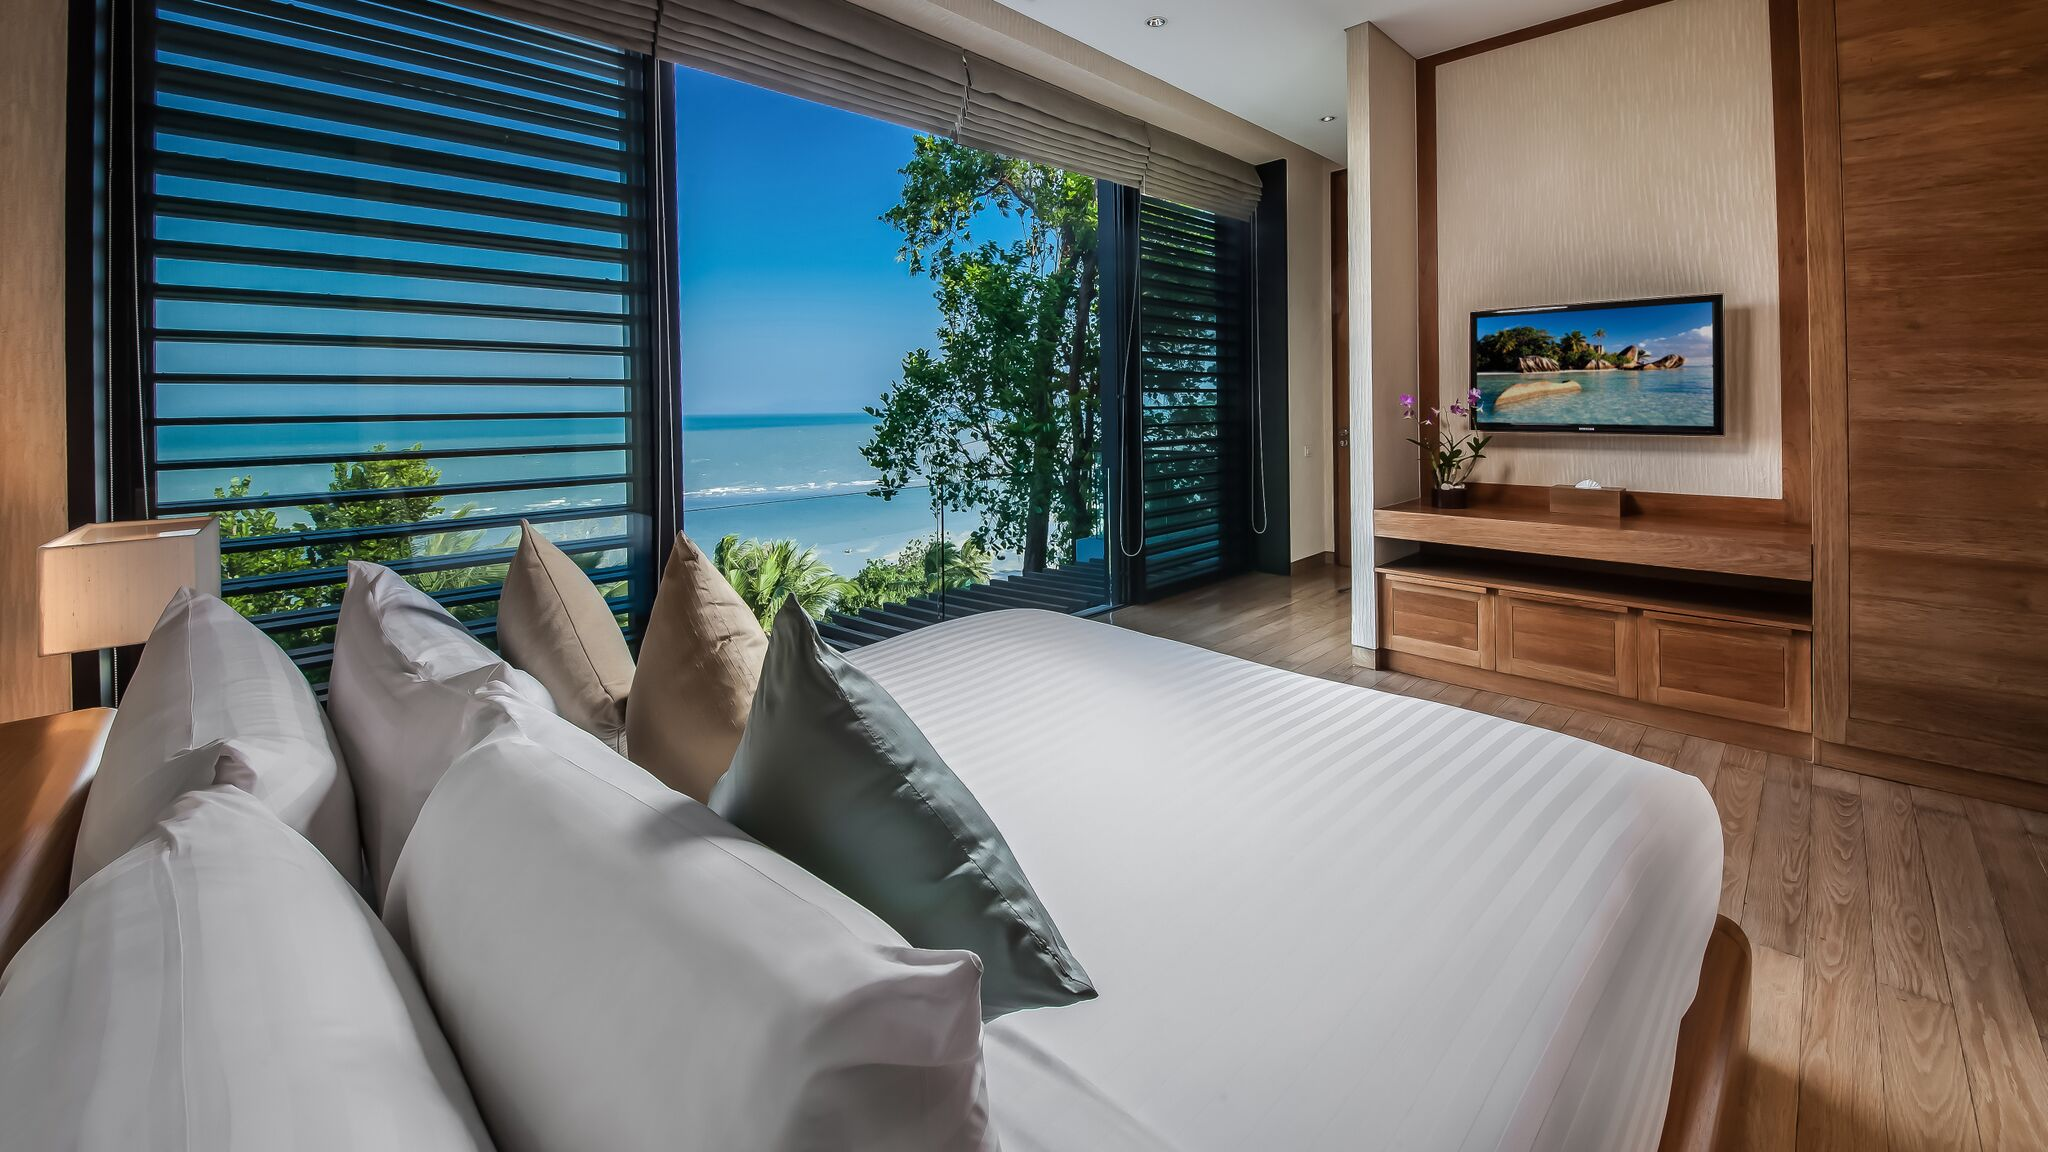 Villa Sawarin: Phuket, Thailand